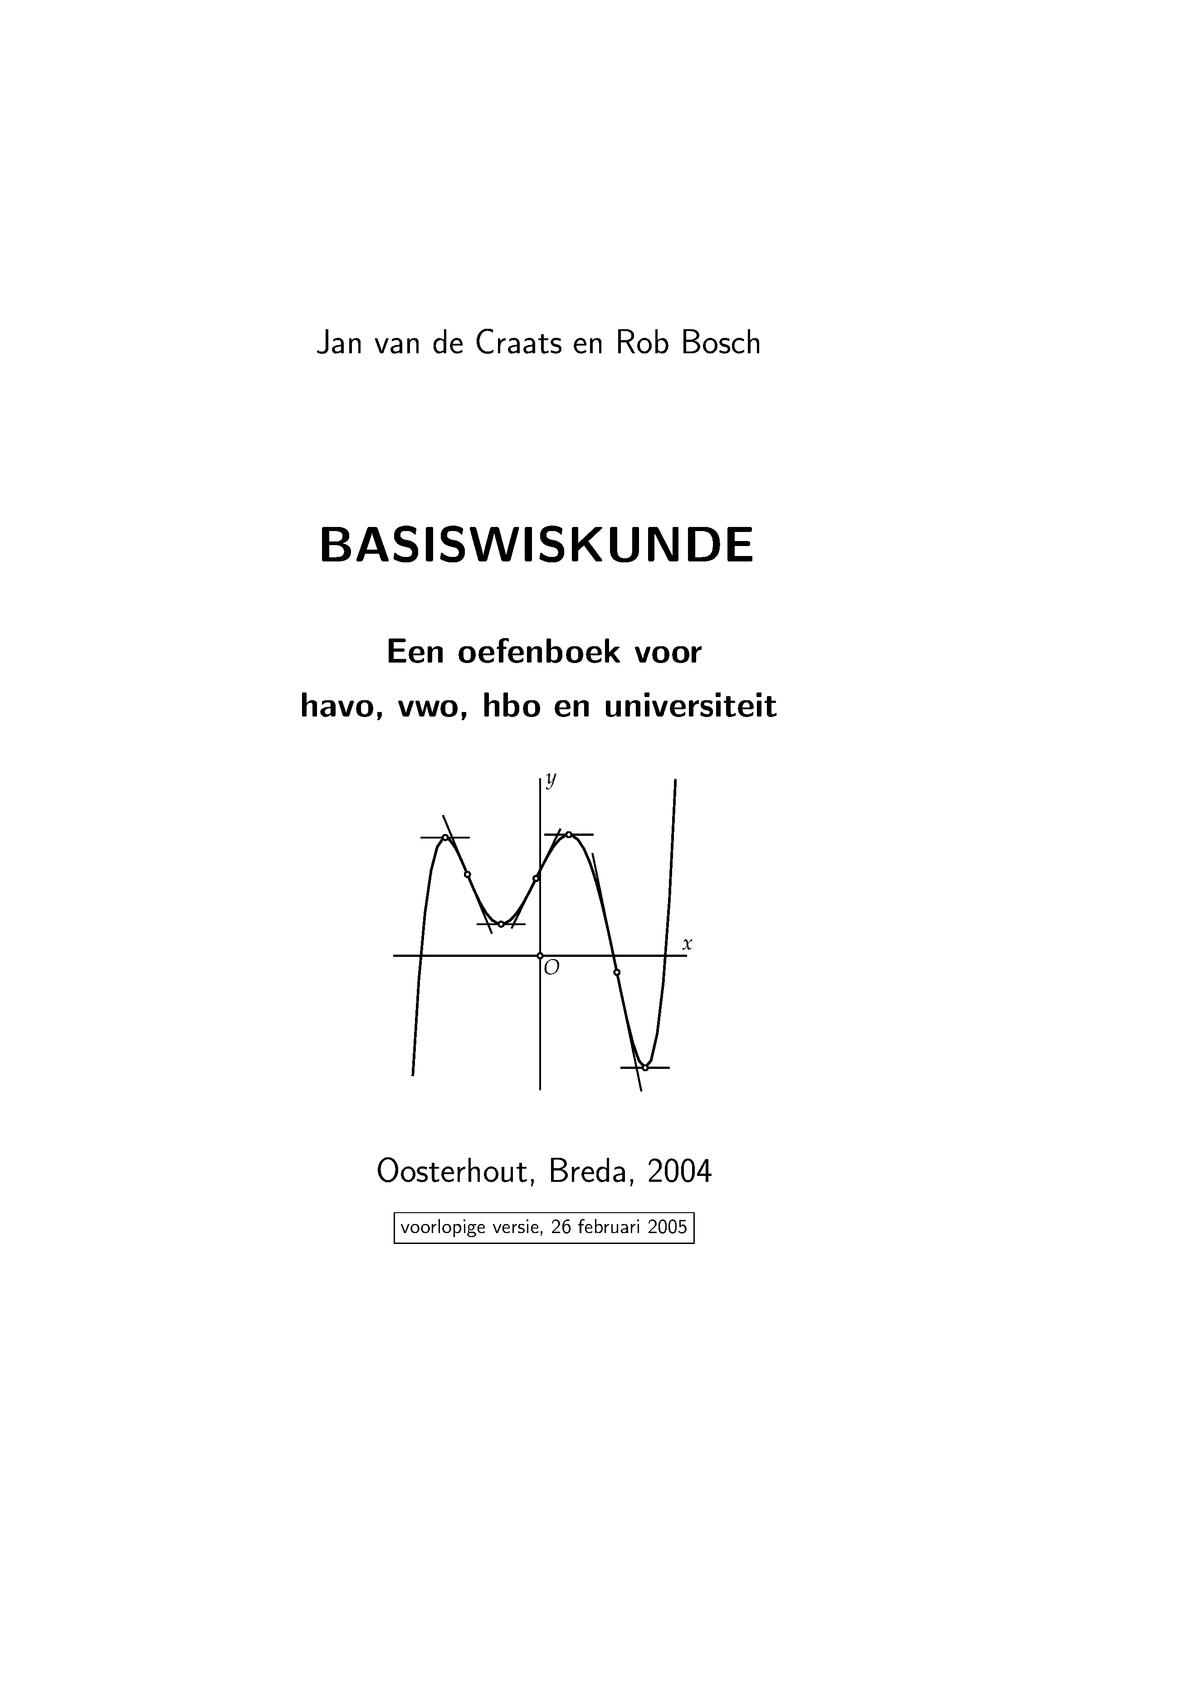 Basiswiskunde - hoi - Basisvaardigheden Wiskunde - StudeerSnel